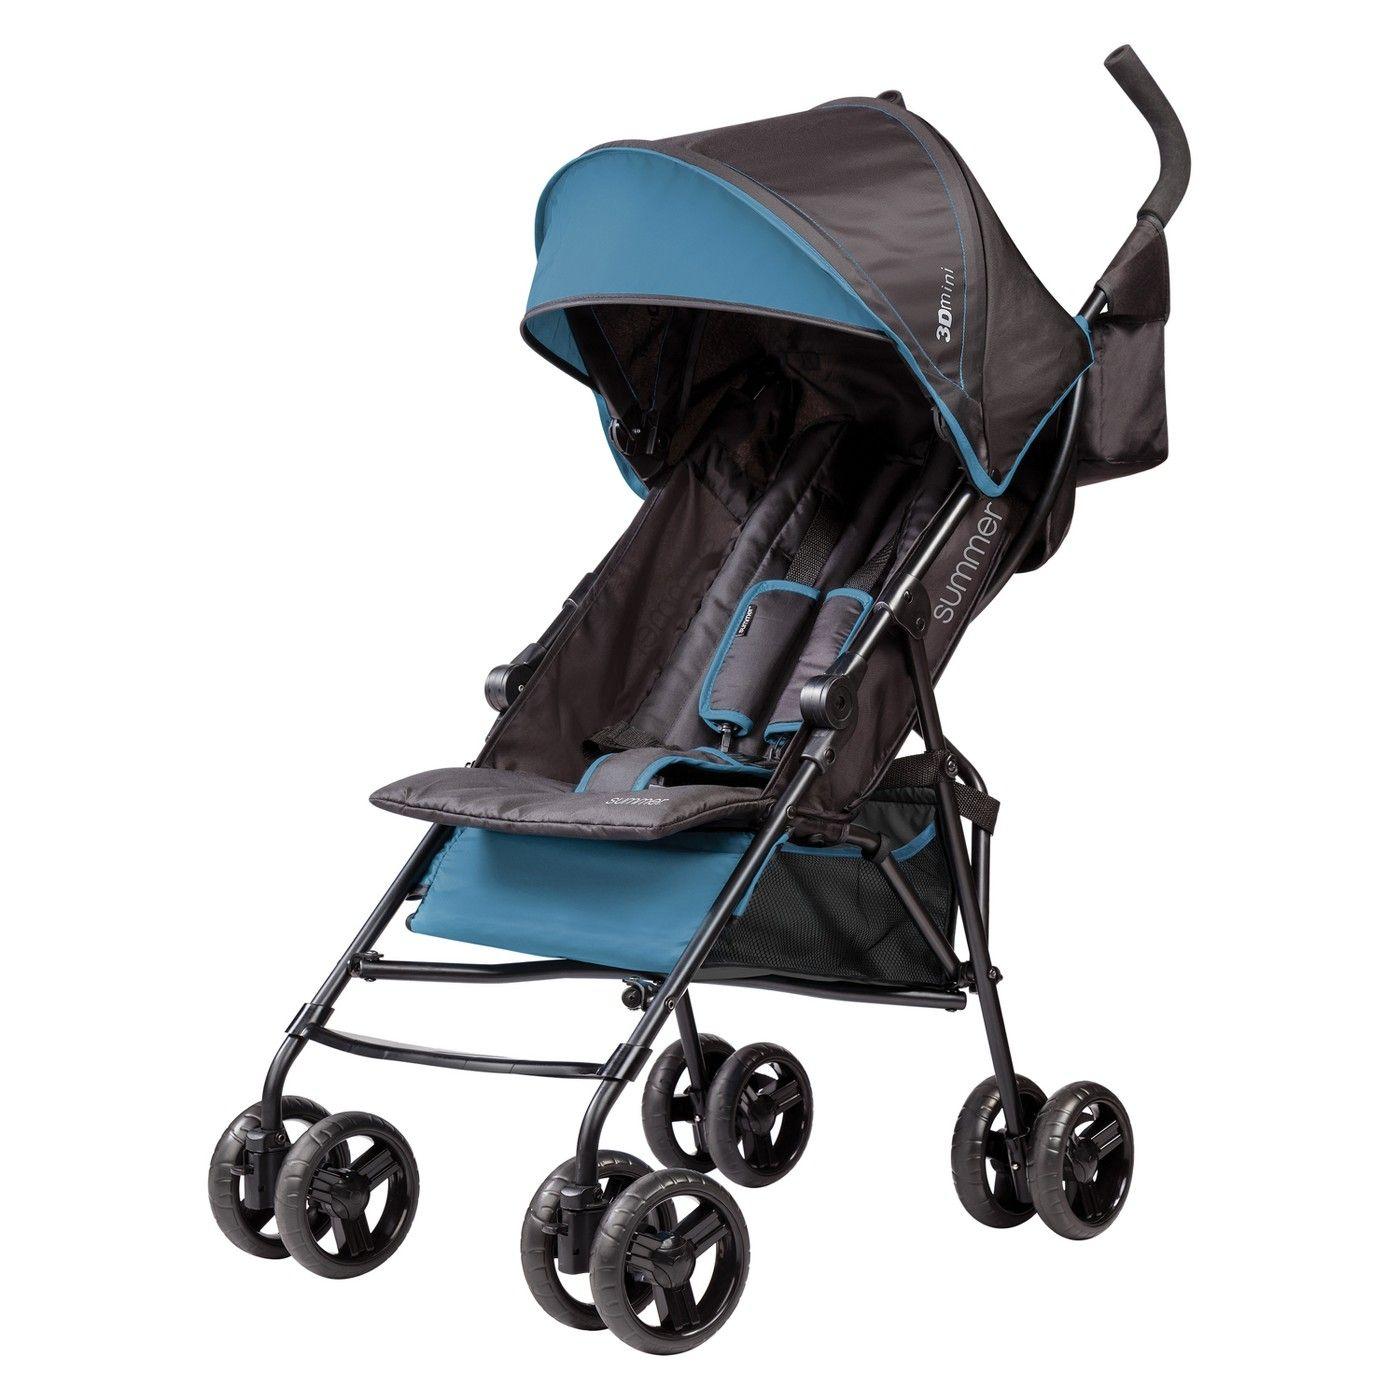 Summer 3Dmini Convenience Stroller Blue Stroller, Baby